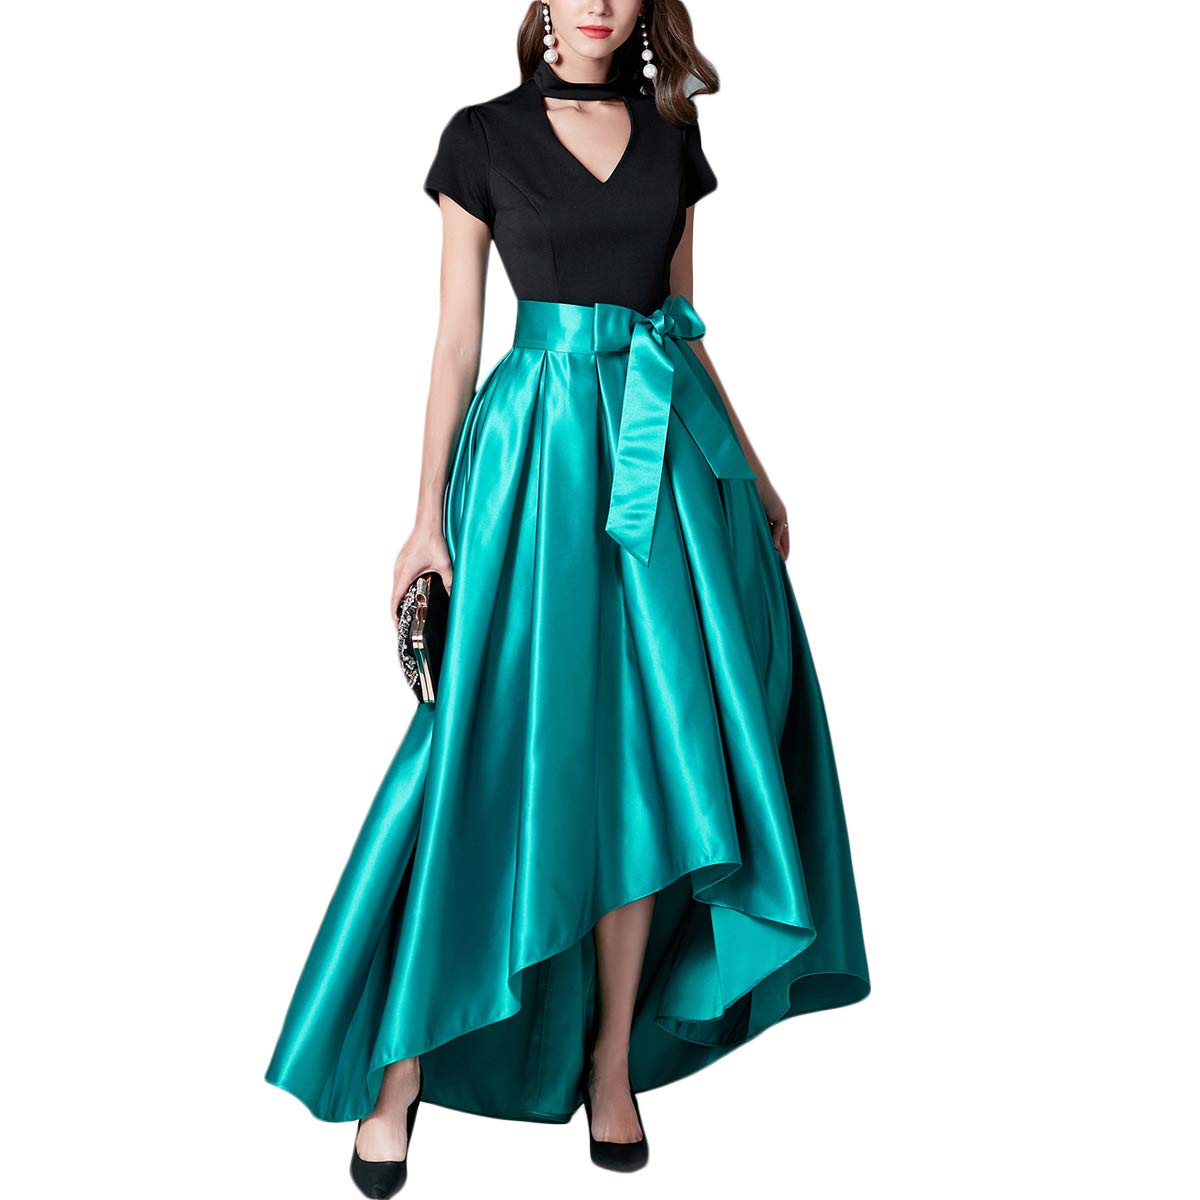 bluee Women V Neck Short Sleeve High Low Patchwork Bow Tie Swing Maxi Evening Dress